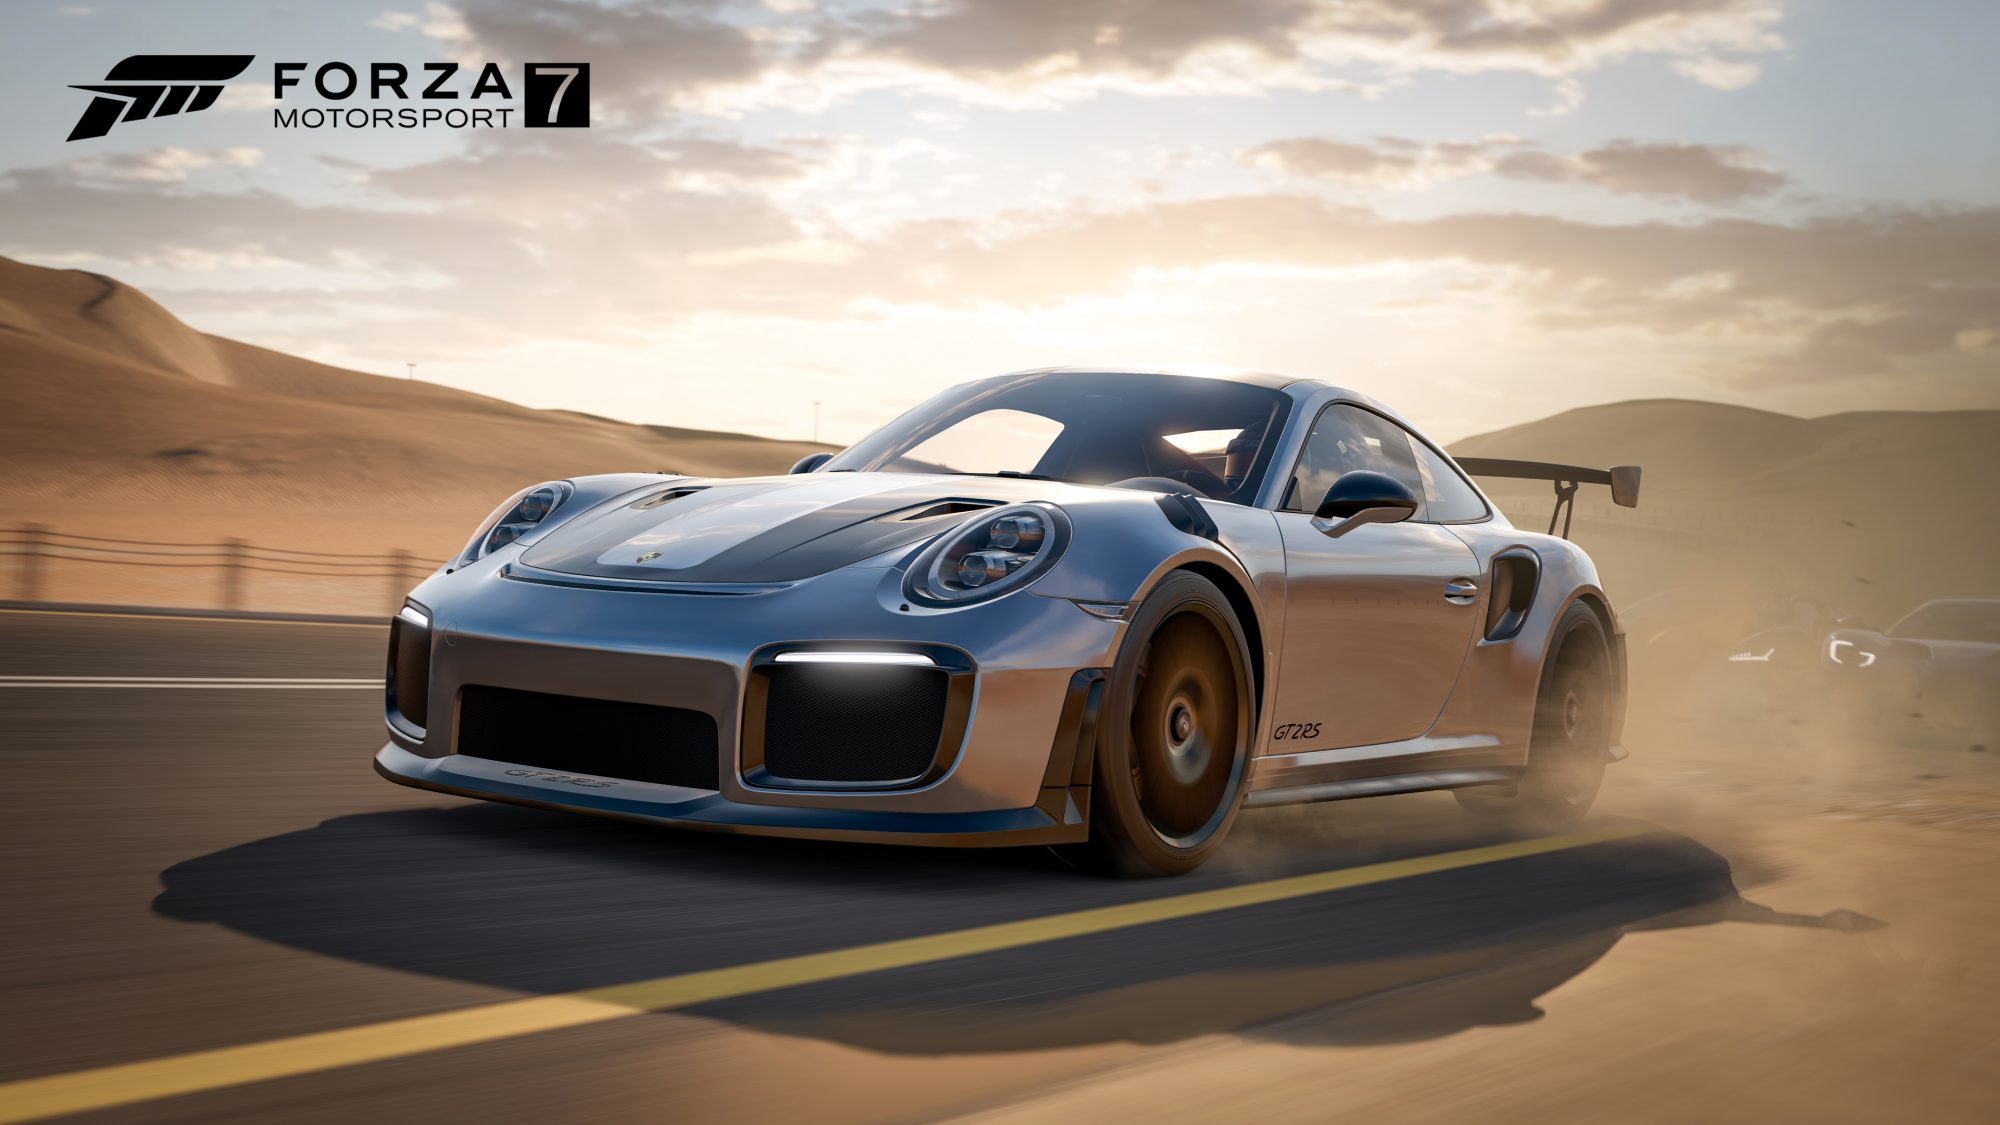 Forza Motorsport 7 Xbox One X PC Review Test 4